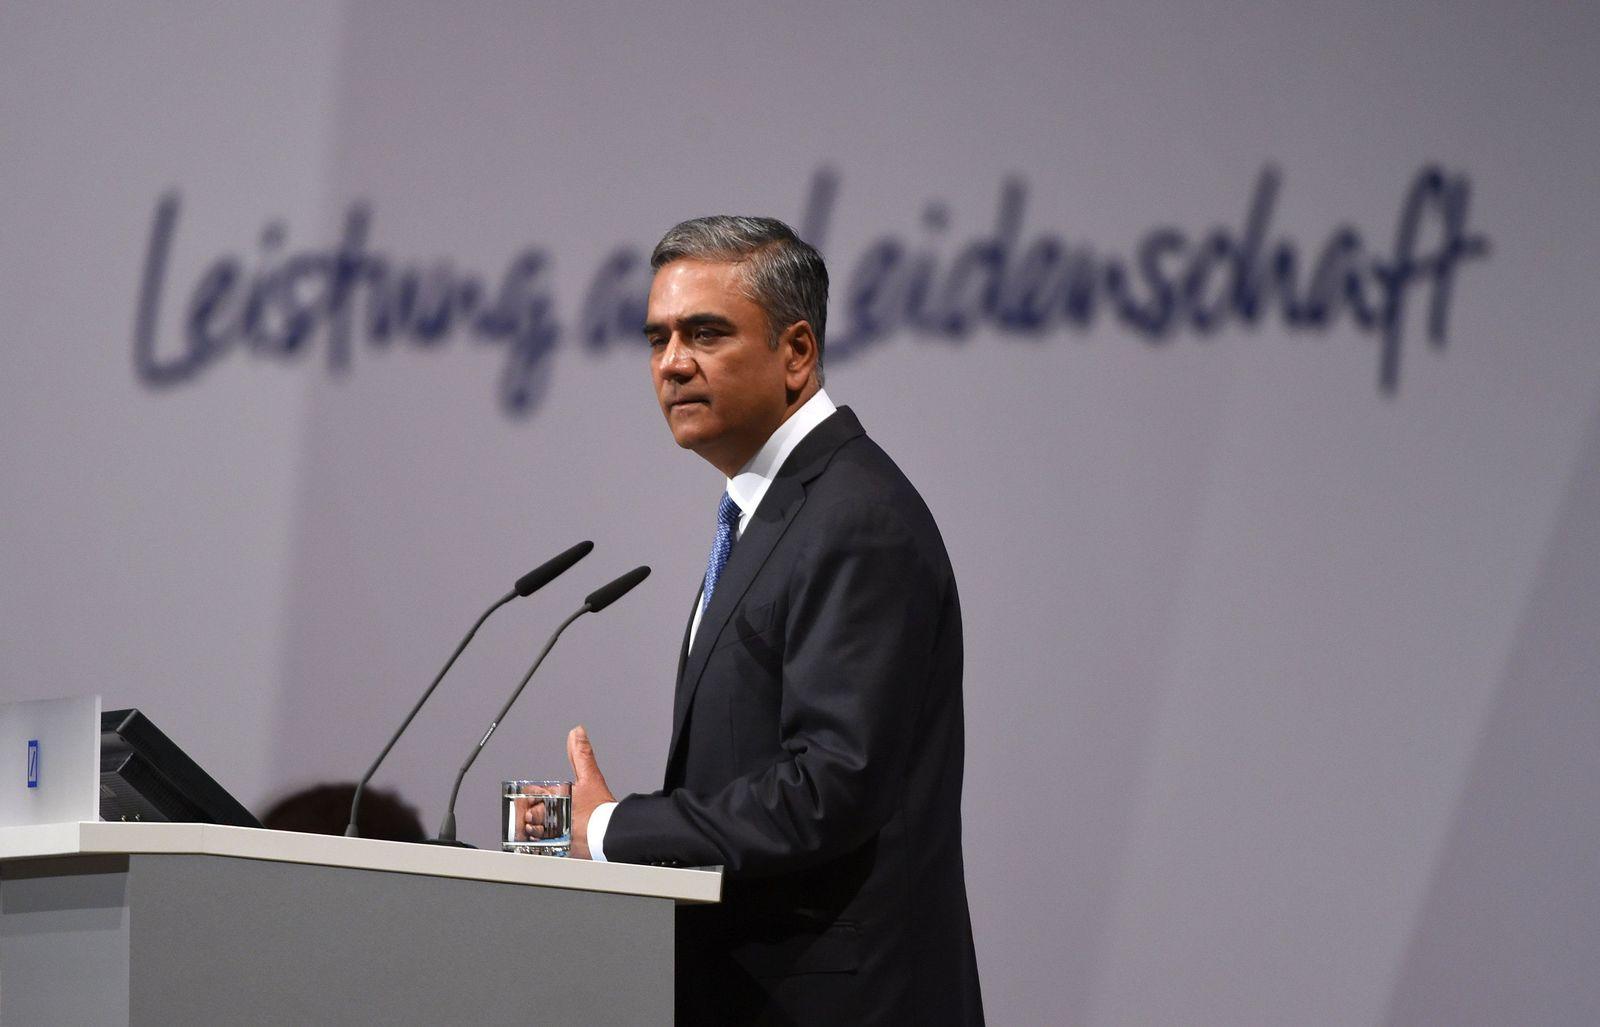 Anshu Jain/ Hauptversammlung Deutsche Bank